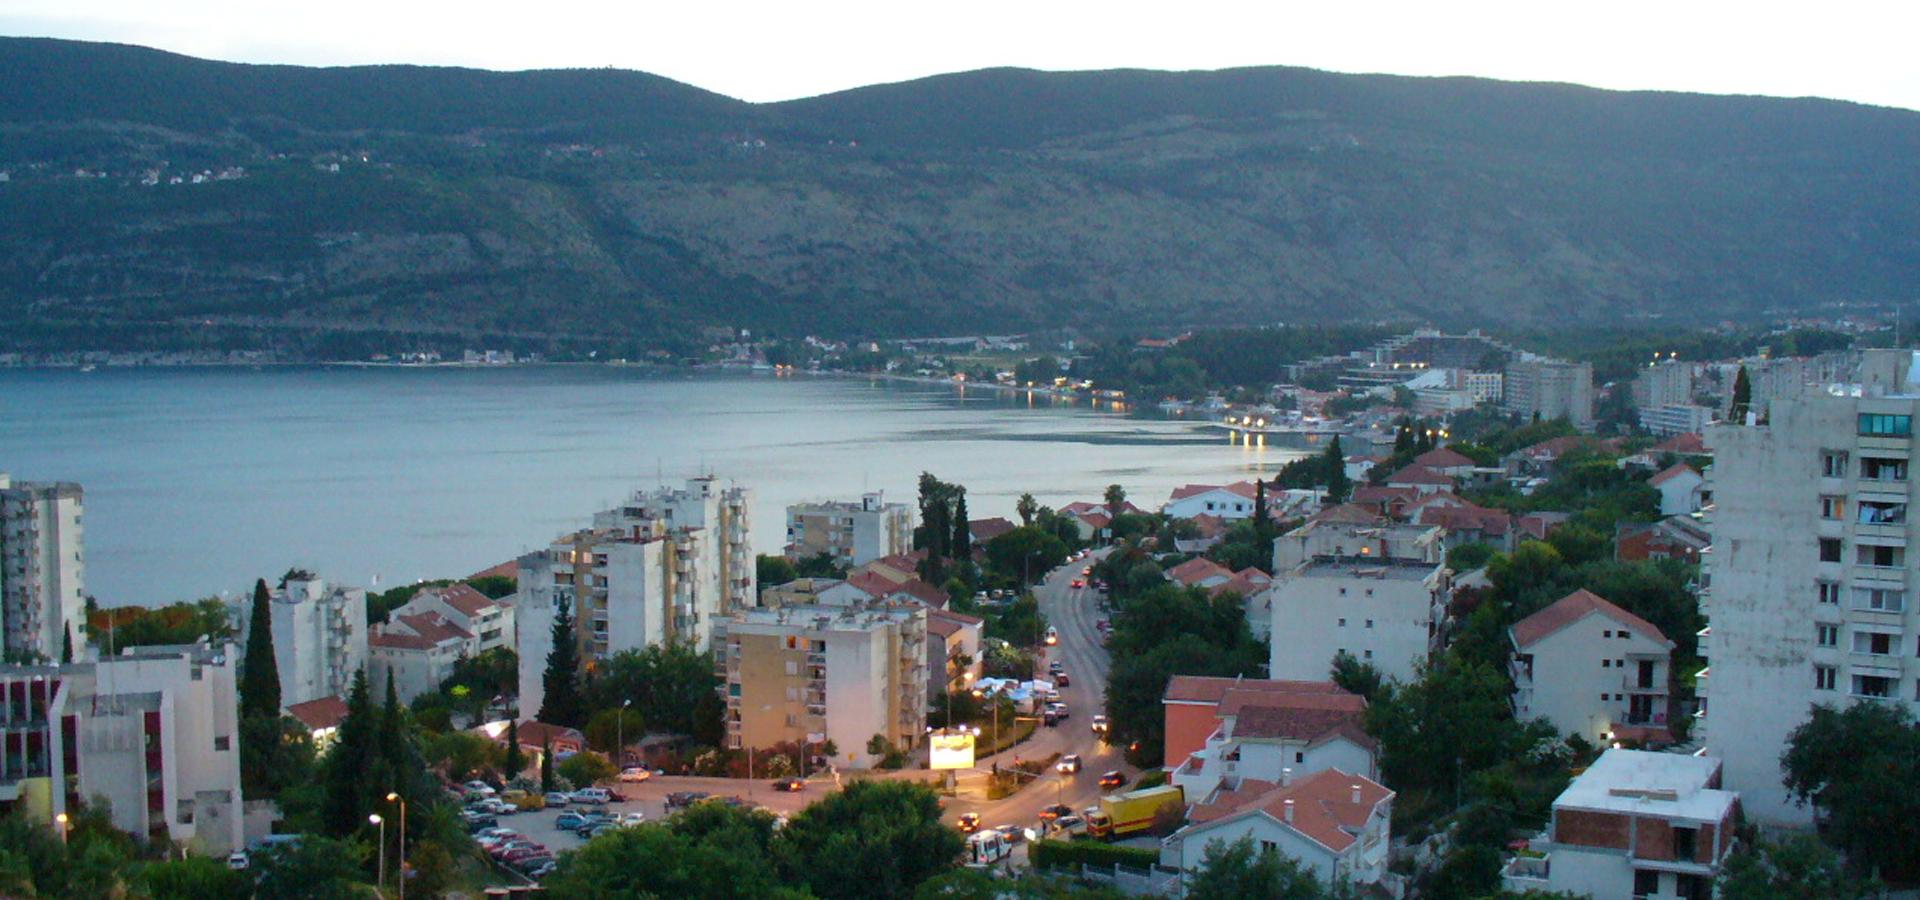 Peer-to-peer advisory in Podgorica, Herceg Novi, Montenegro